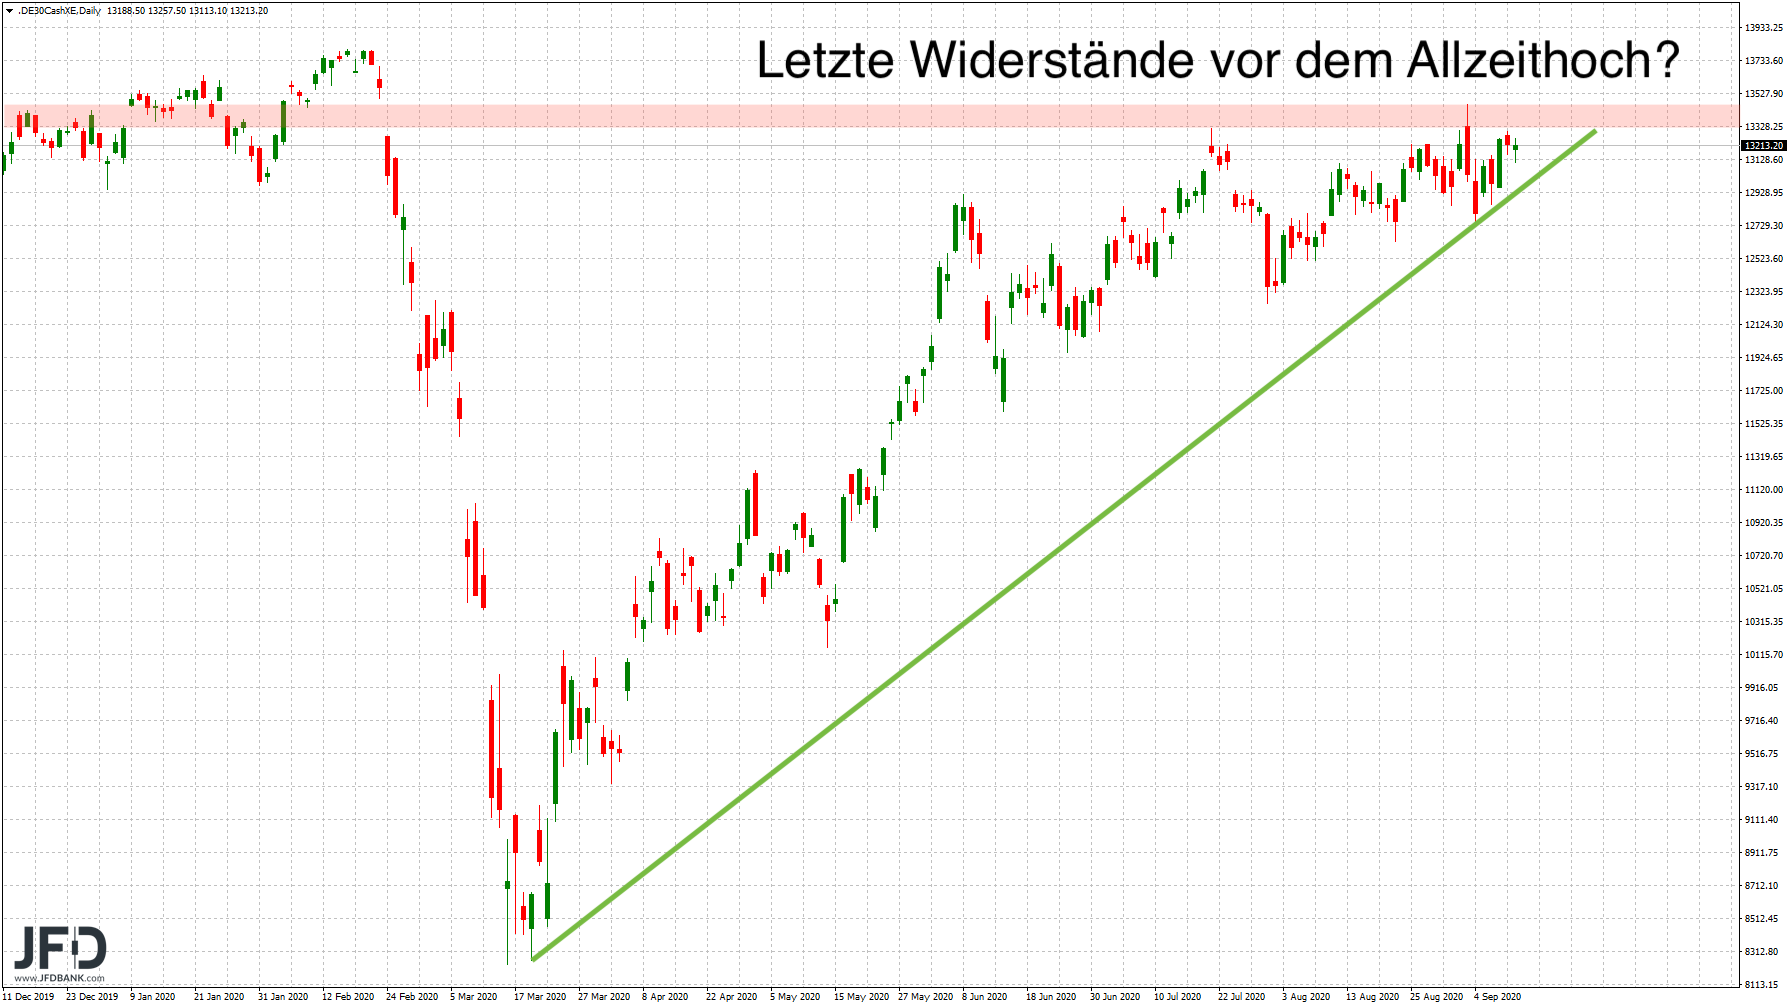 Wochenstart-im-DAX-erneut-unter-Volldampf-Kommentar-JFD-Bank-GodmodeTrader.de-3